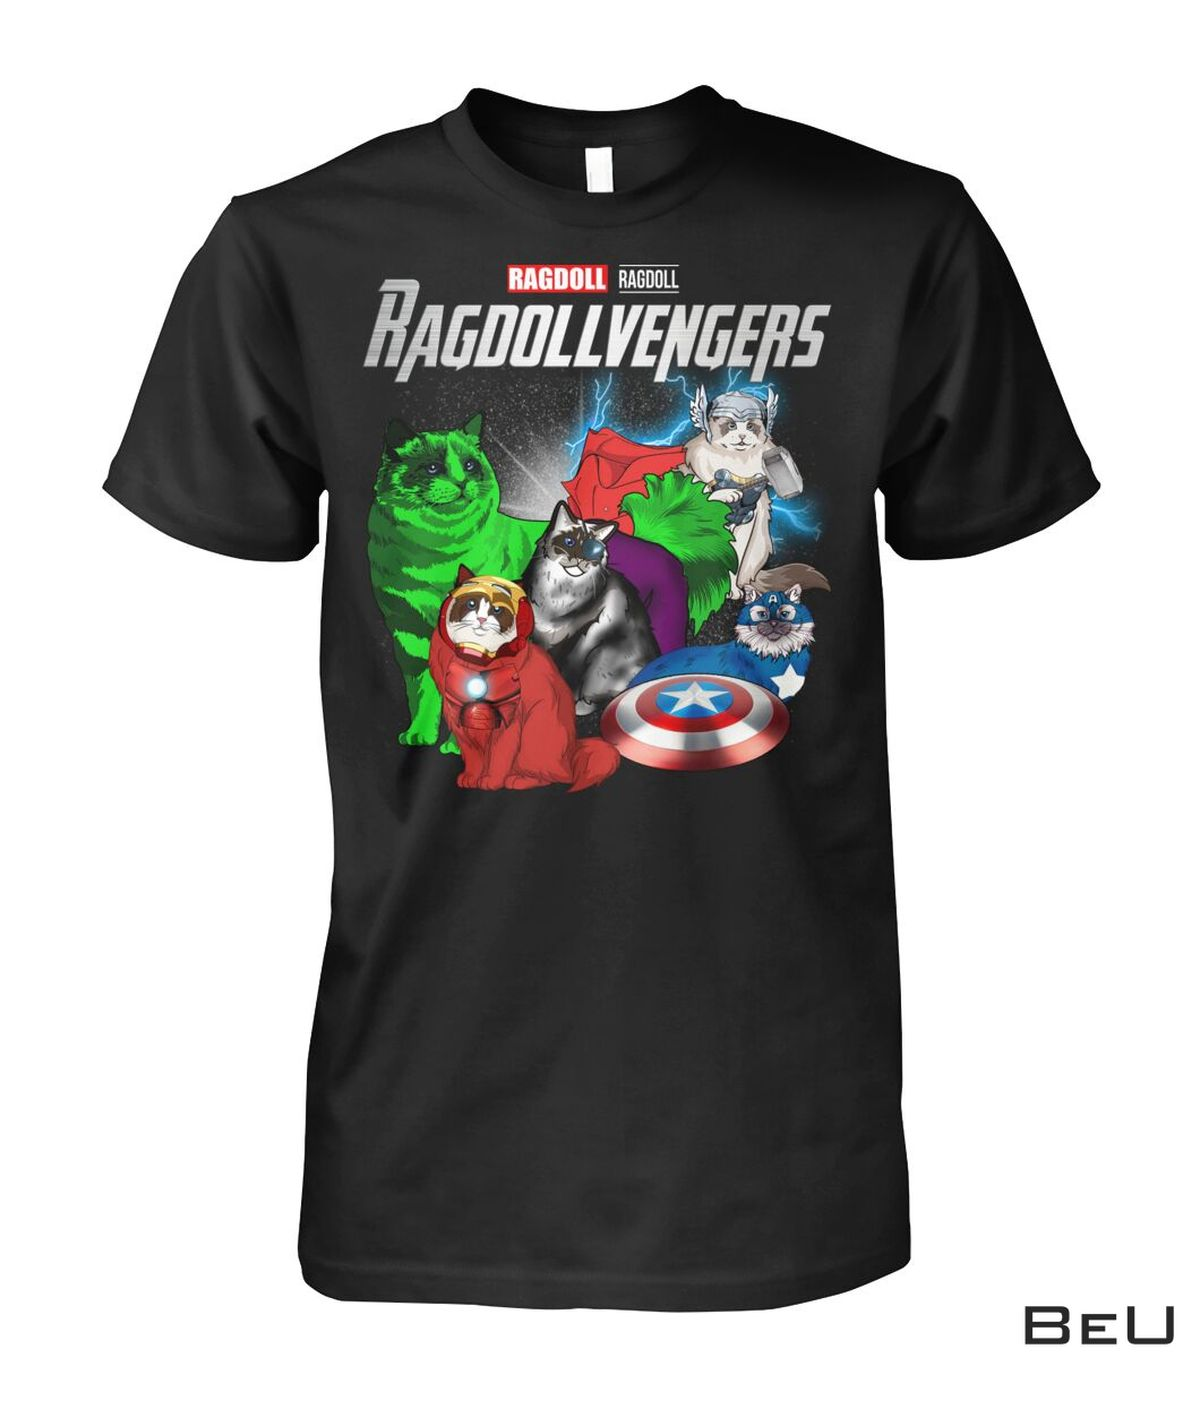 Ragdollvengers Ragdoll Cat Avengers Shirt, hoodie, tank top